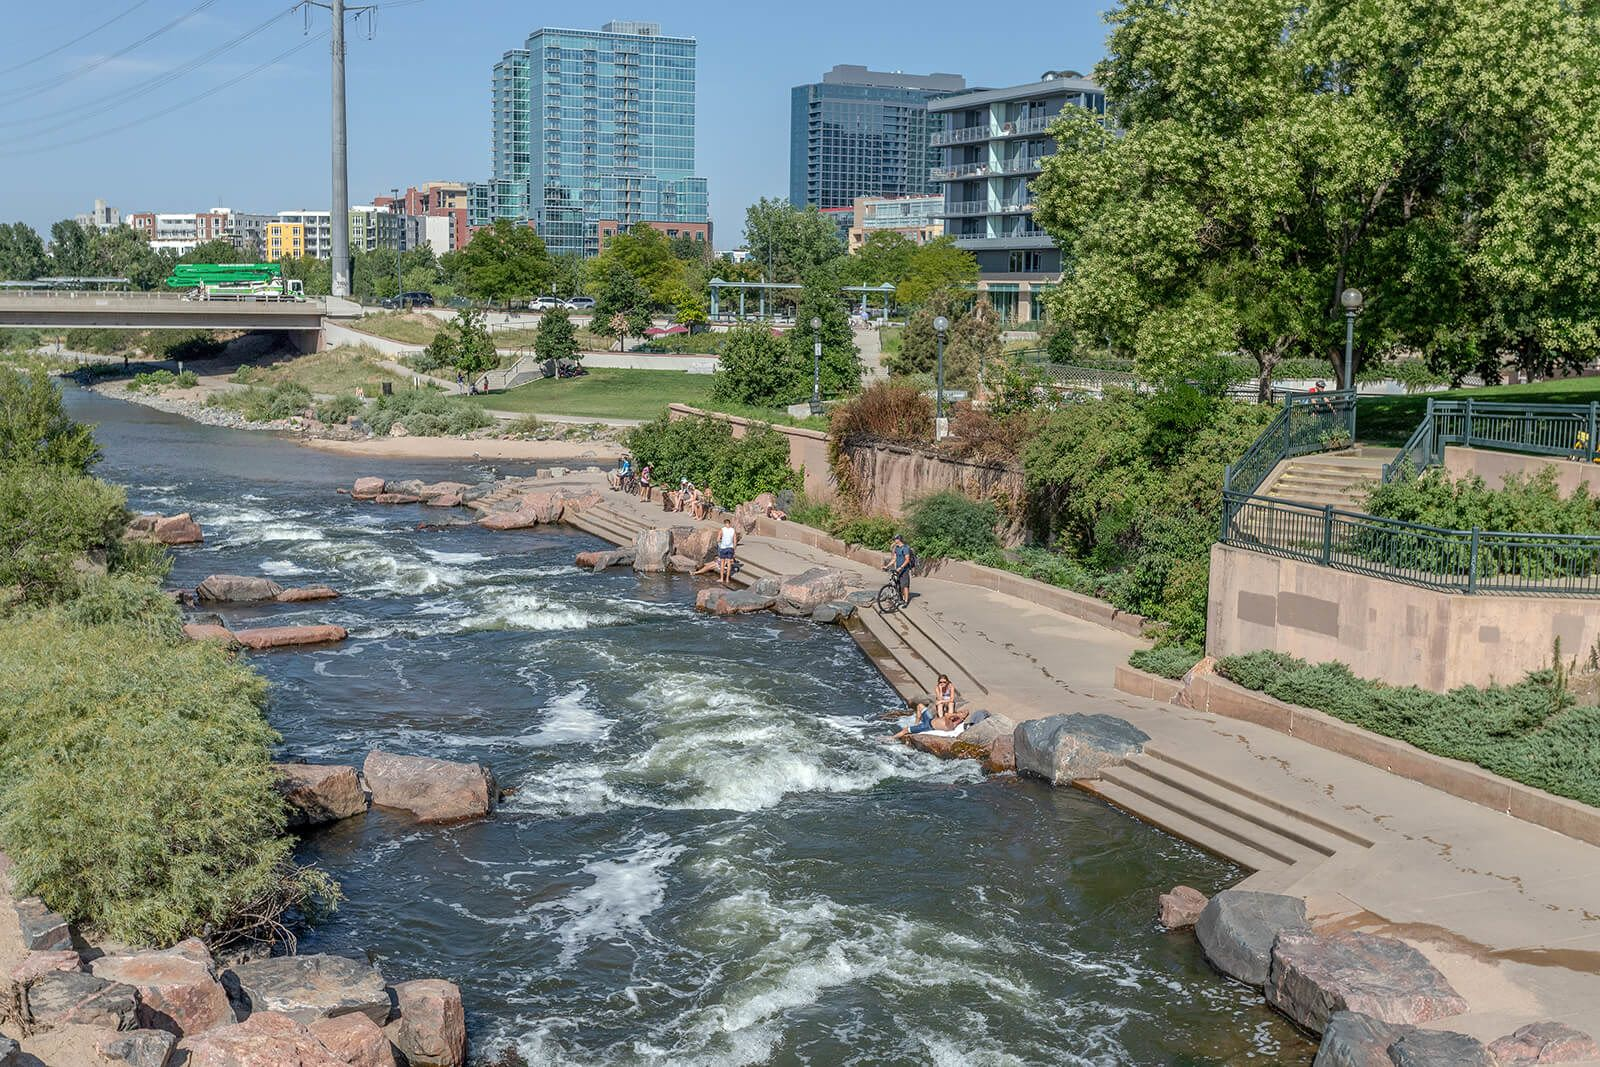 Platte River Path Bike Trail near Element 47 by Windsor, Denver, CO